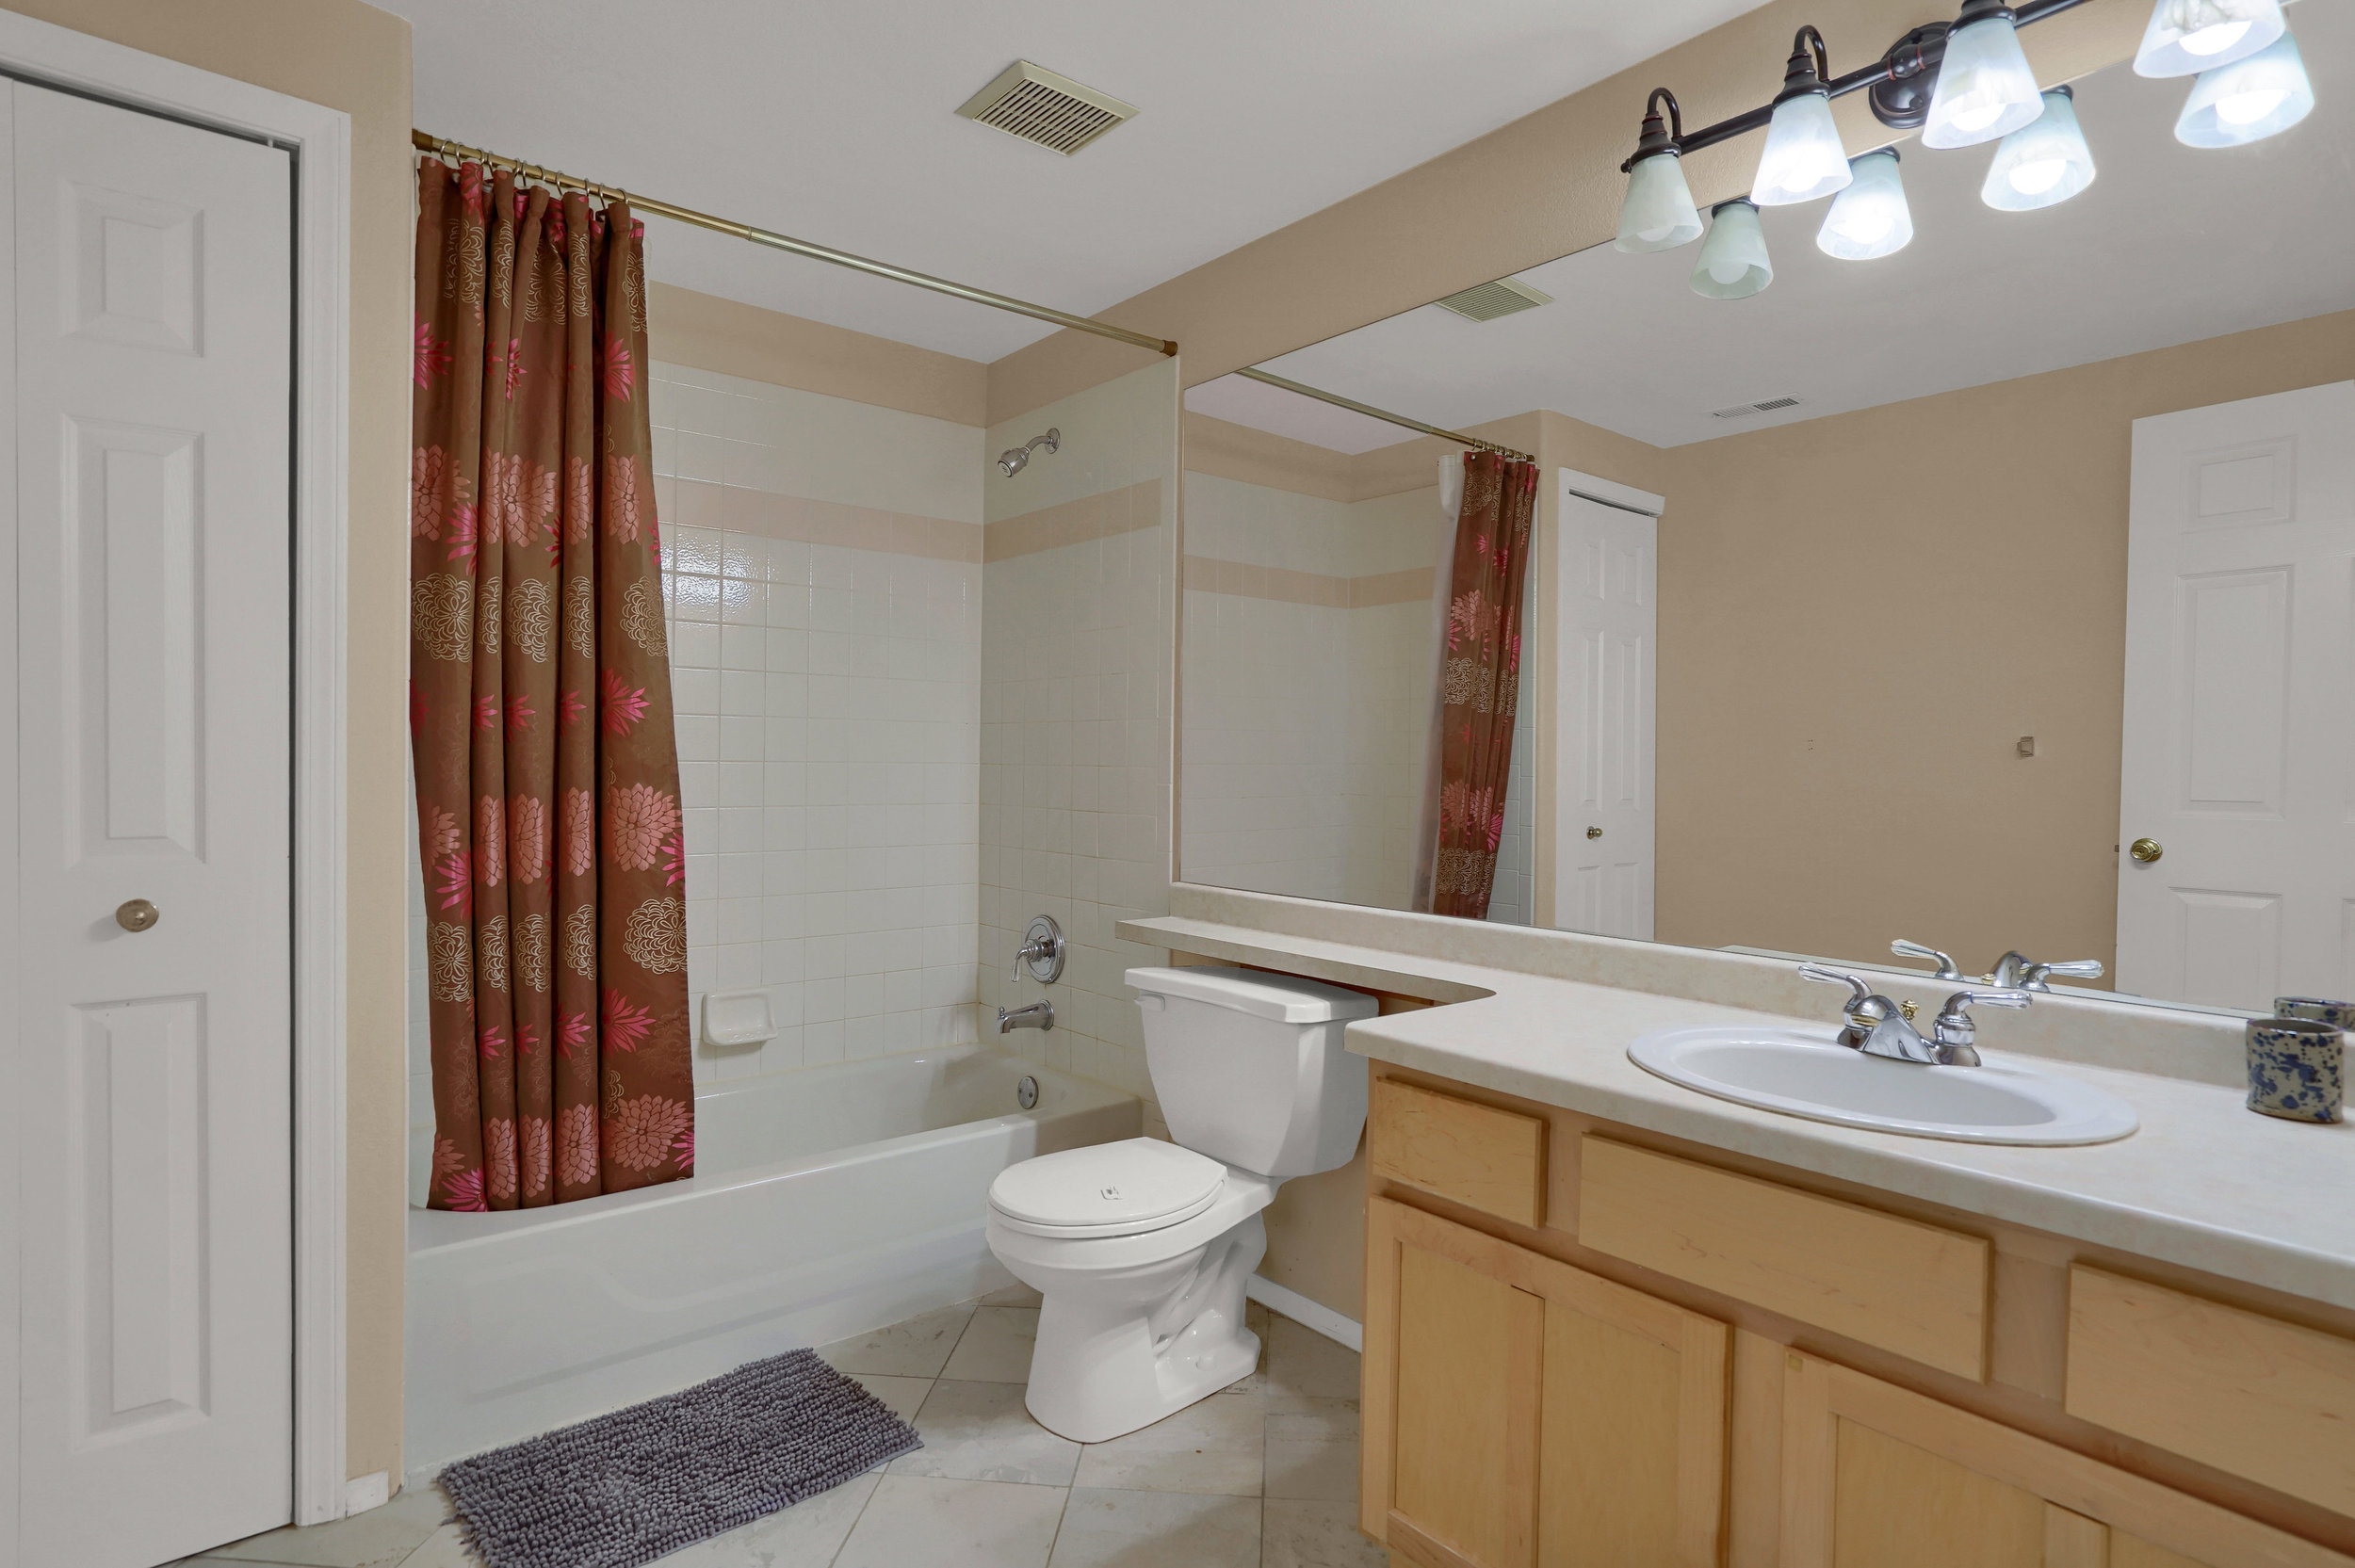 2756 Kittyhawk Road Colorado-print-027-009-Bathroom-3932x2619-300dpi.jpg